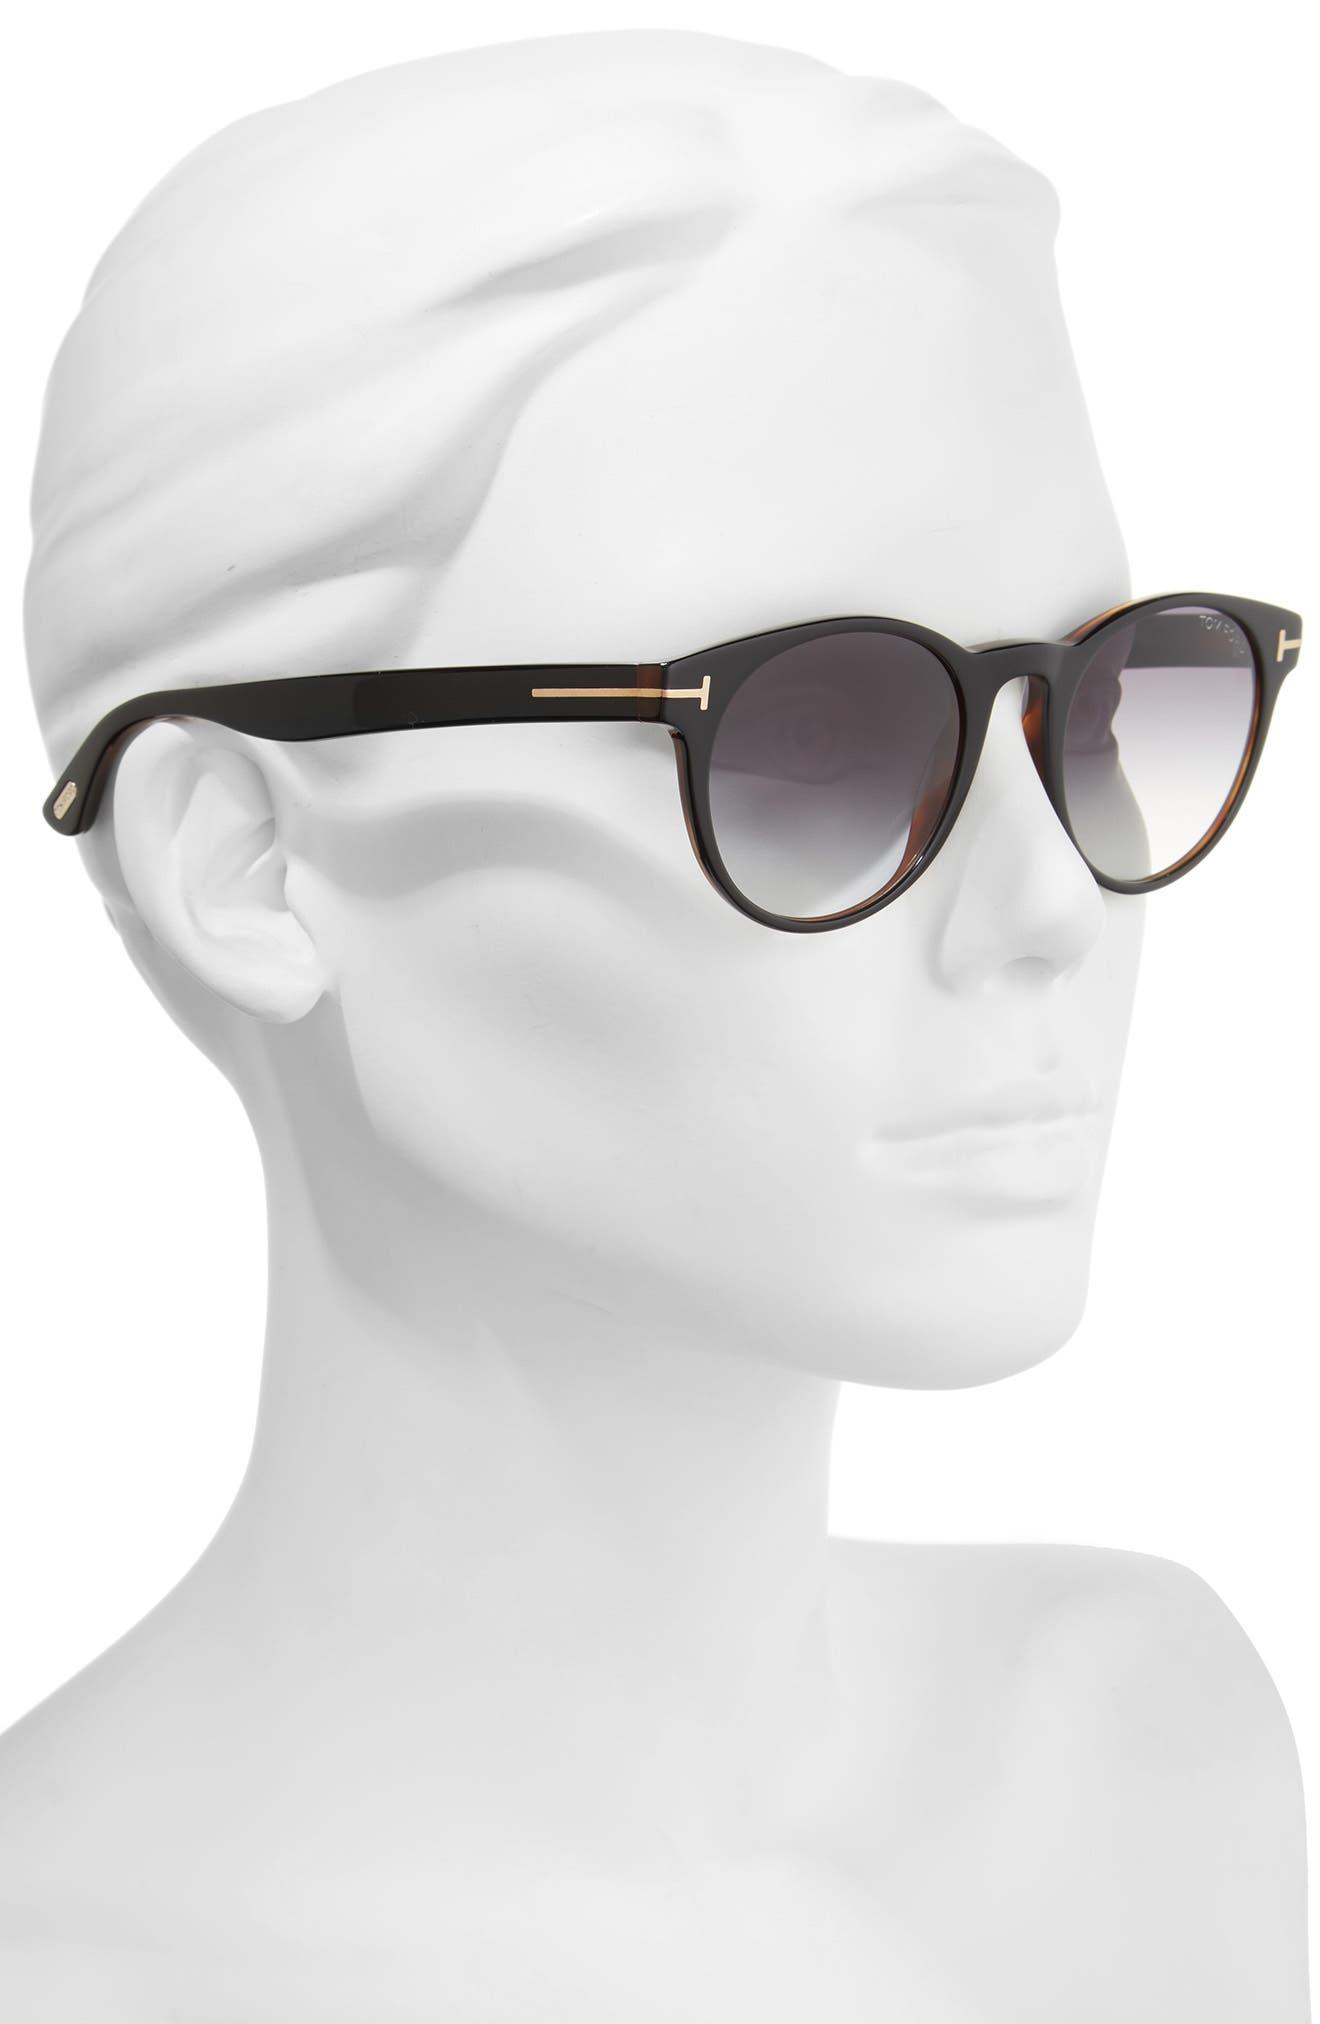 Palmer 51mm Gradient Lens Sunglasses,                             Alternate thumbnail 2, color,                             Black/ Gradient Smoke